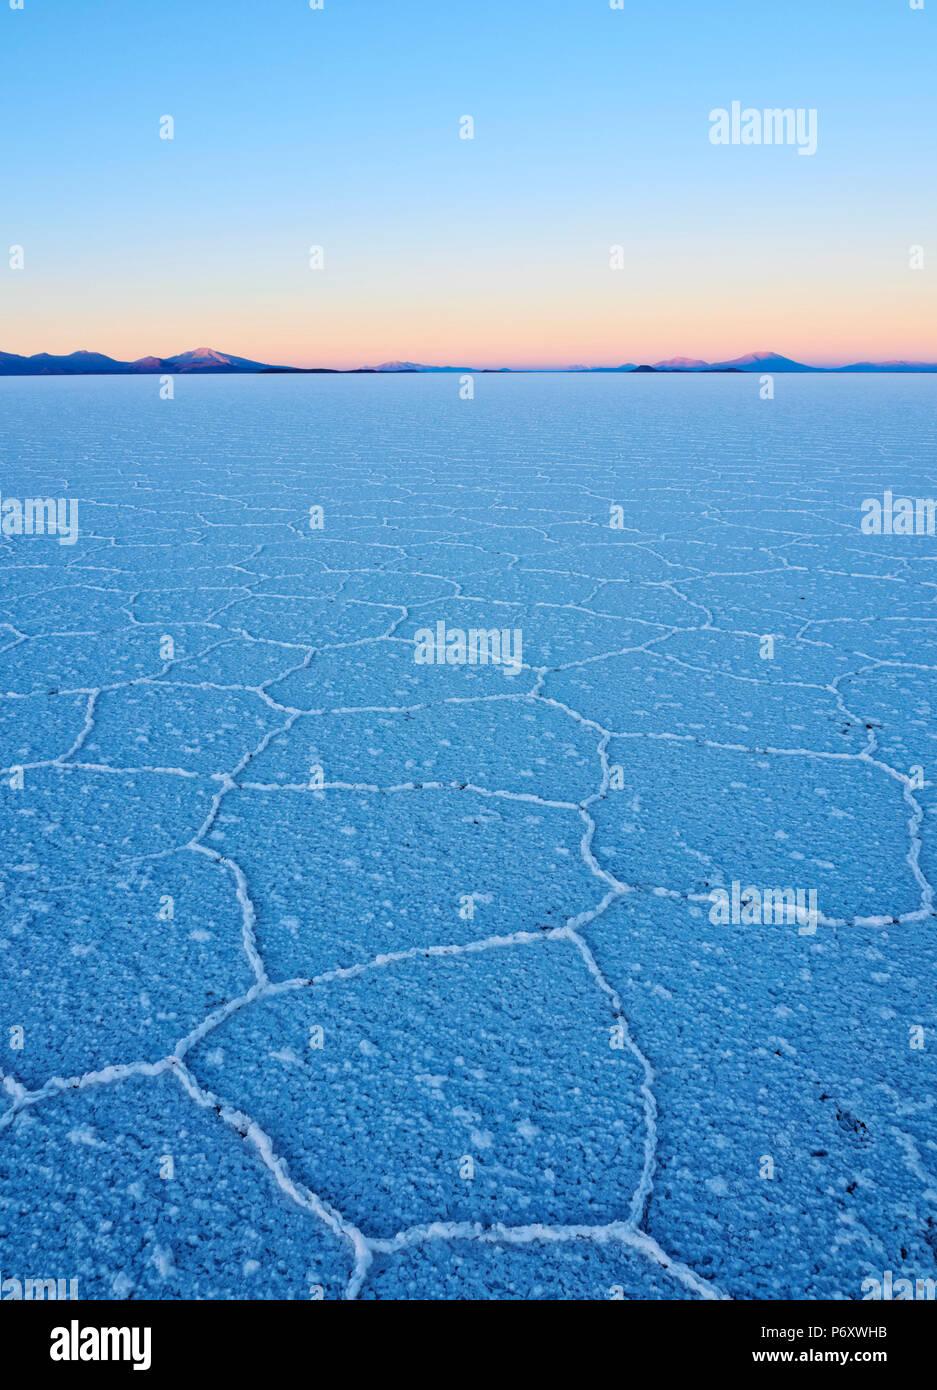 Bolivia, Potosi Department, Daniel Campos Province, View of the Salar de Uyuni, the largest salt flat in the world at sunrise. Stock Photo